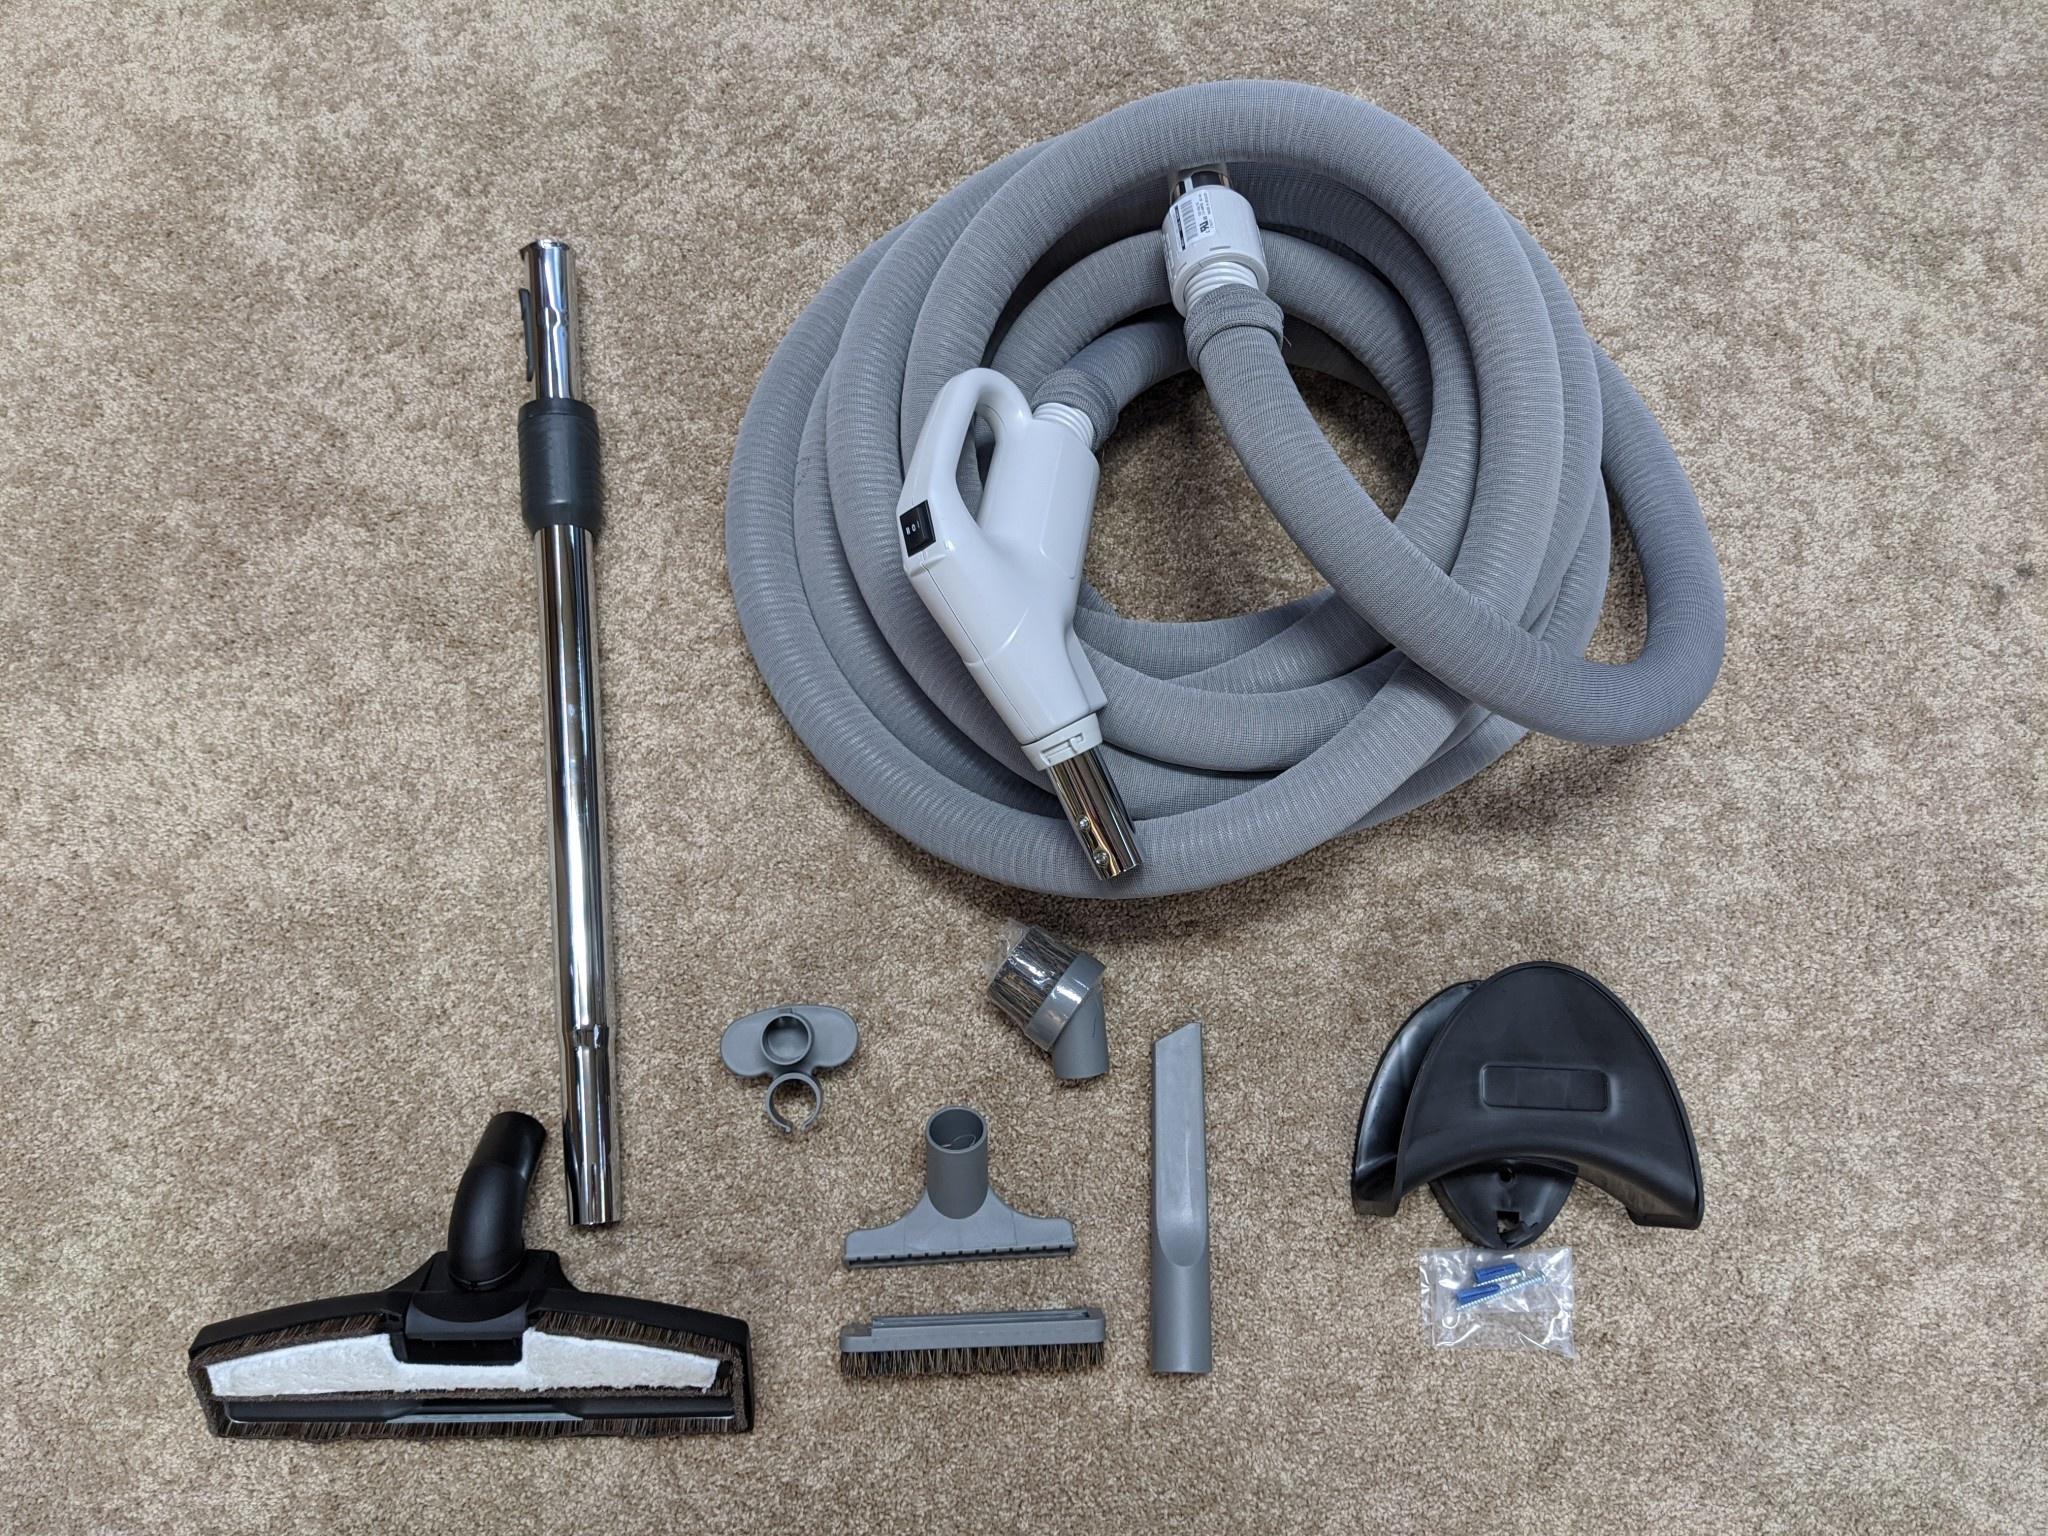 Swiss Boy Copy of 30' Dual-Volt Hose & Tool Set- Pigtail